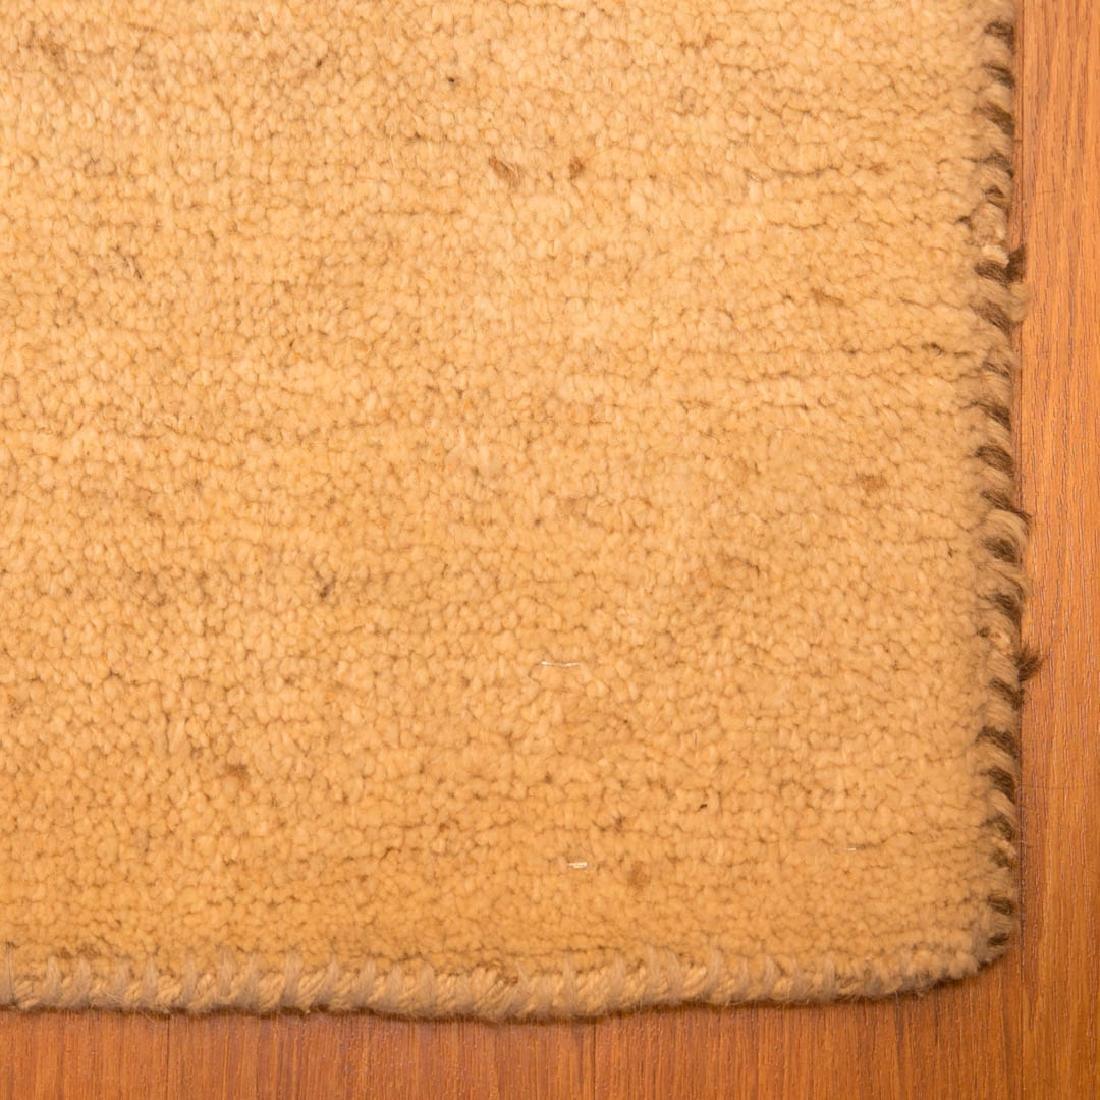 Persian Gabbeh rug, approx. 5.2 x 7.7 - 2